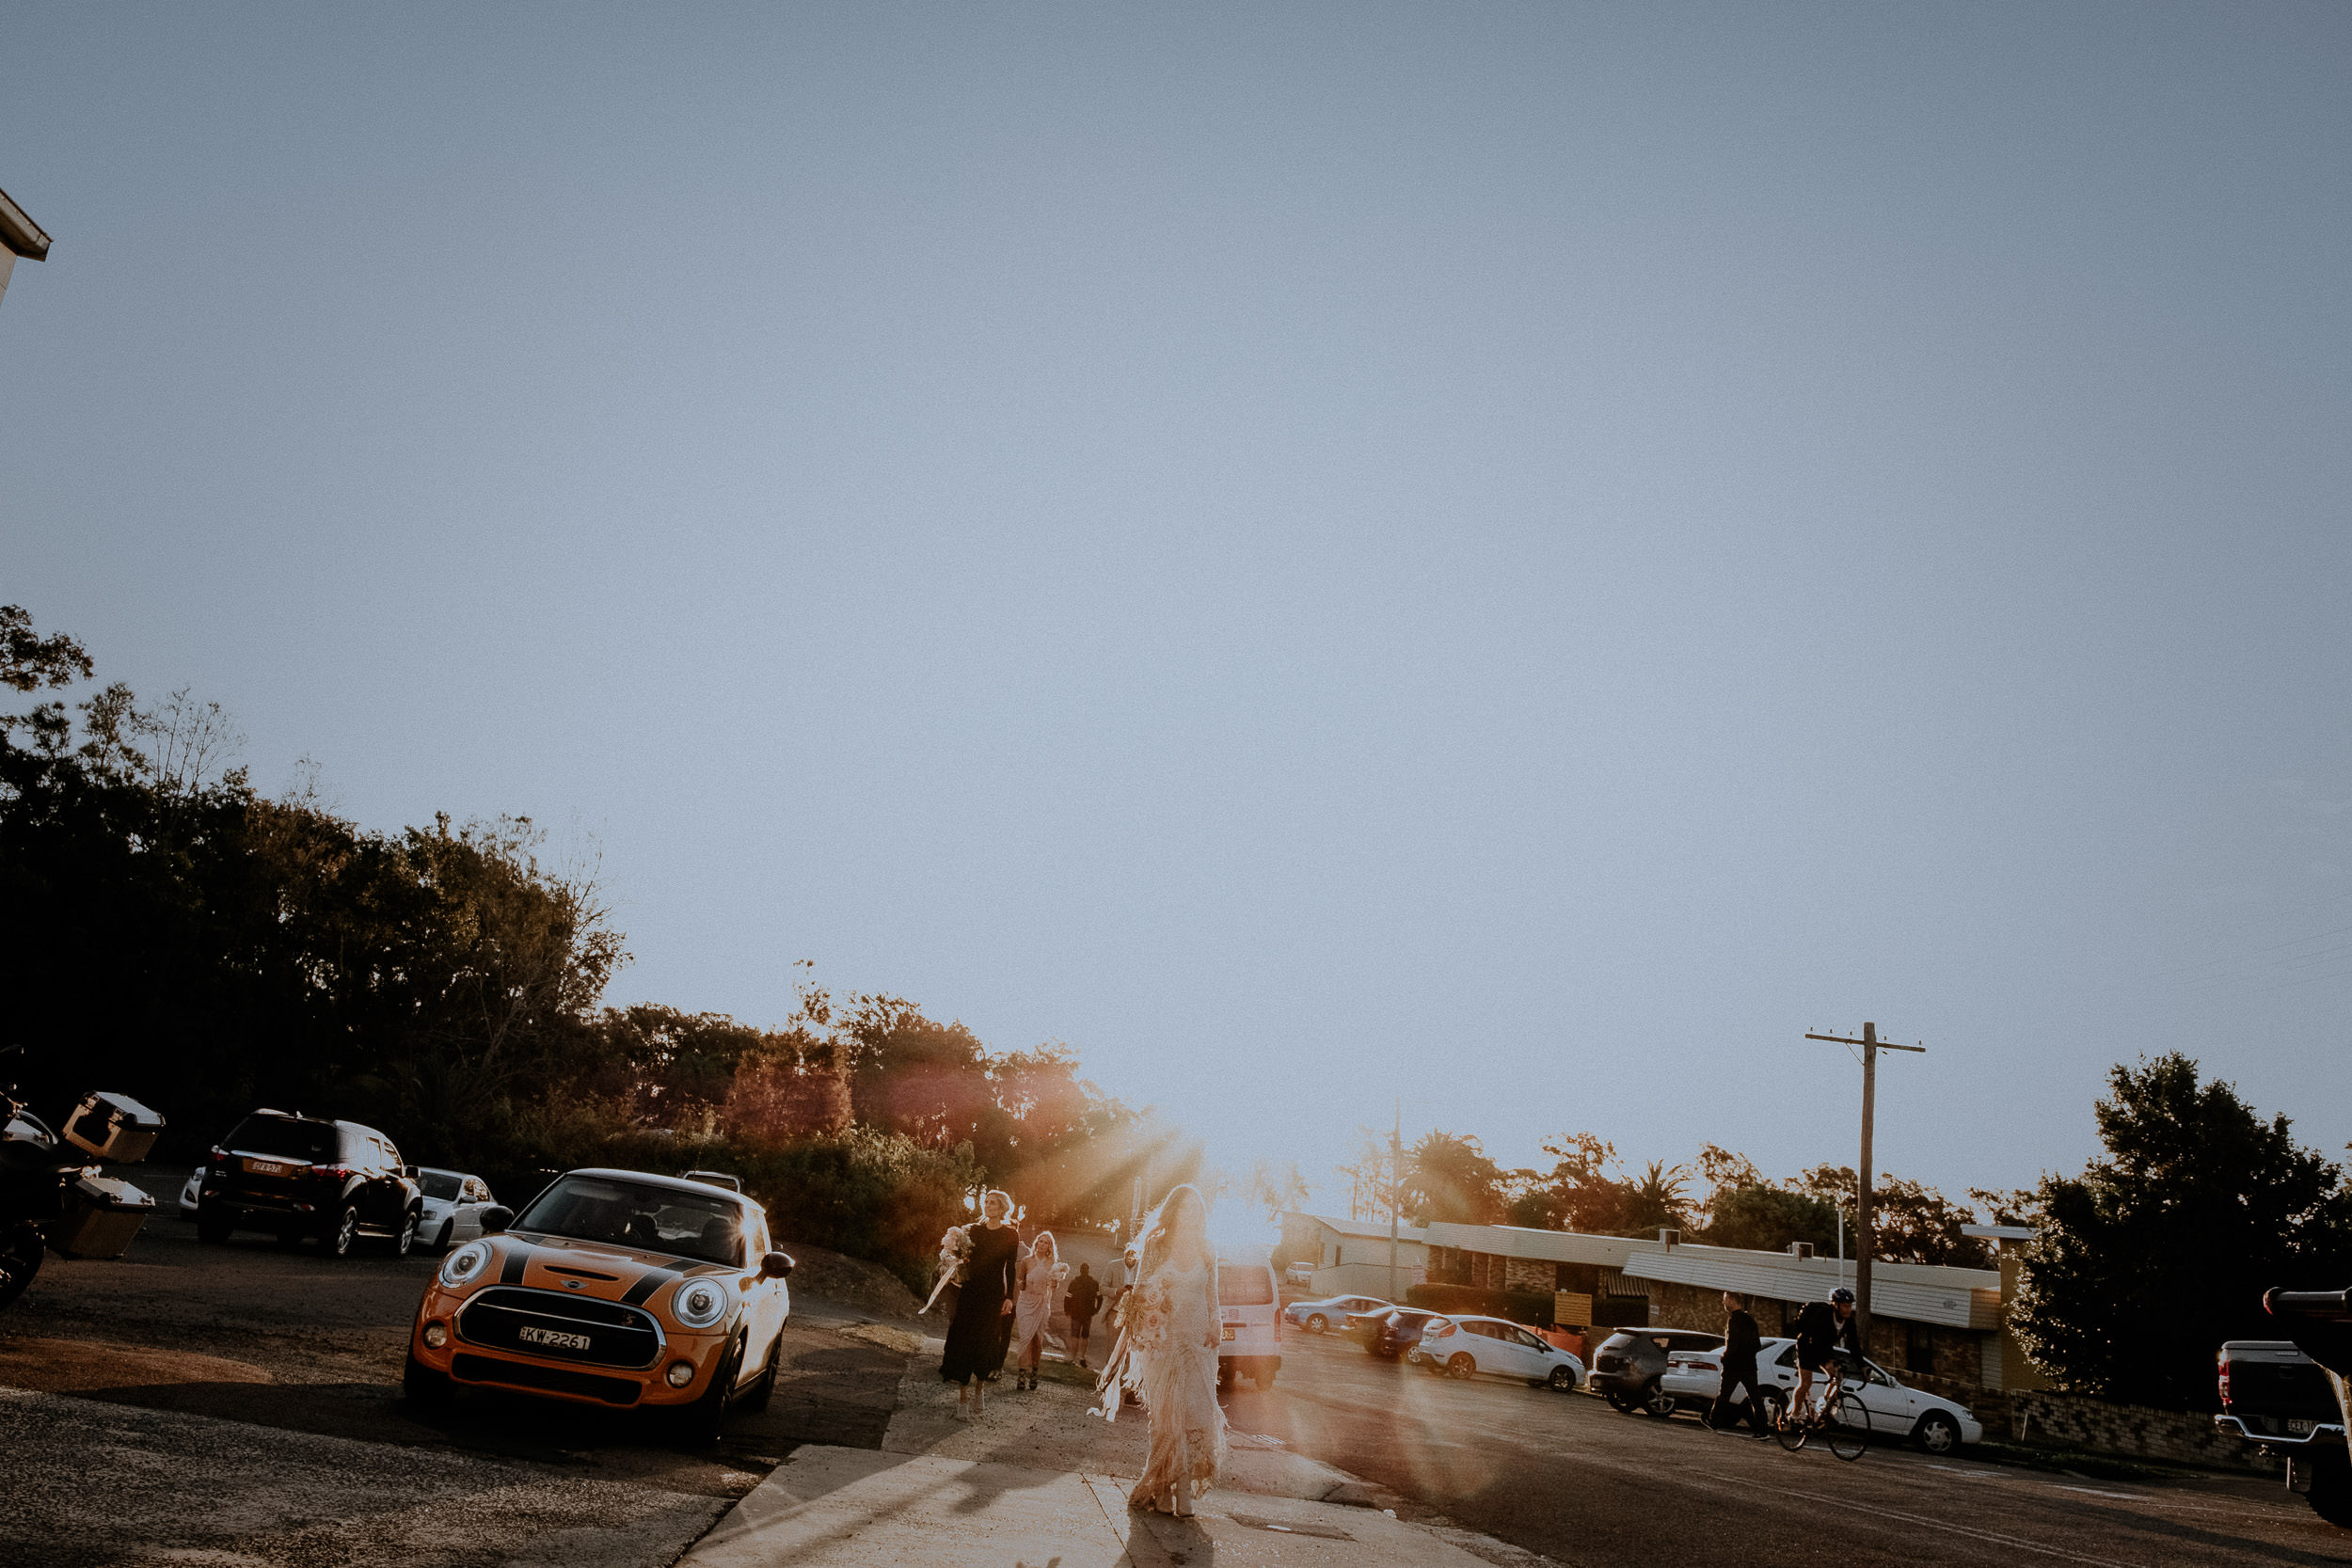 S&A Elopement - Kings & Thieves - Shred 'Til Dead - Central Coast Beach Forest Wedding - 343.jpg